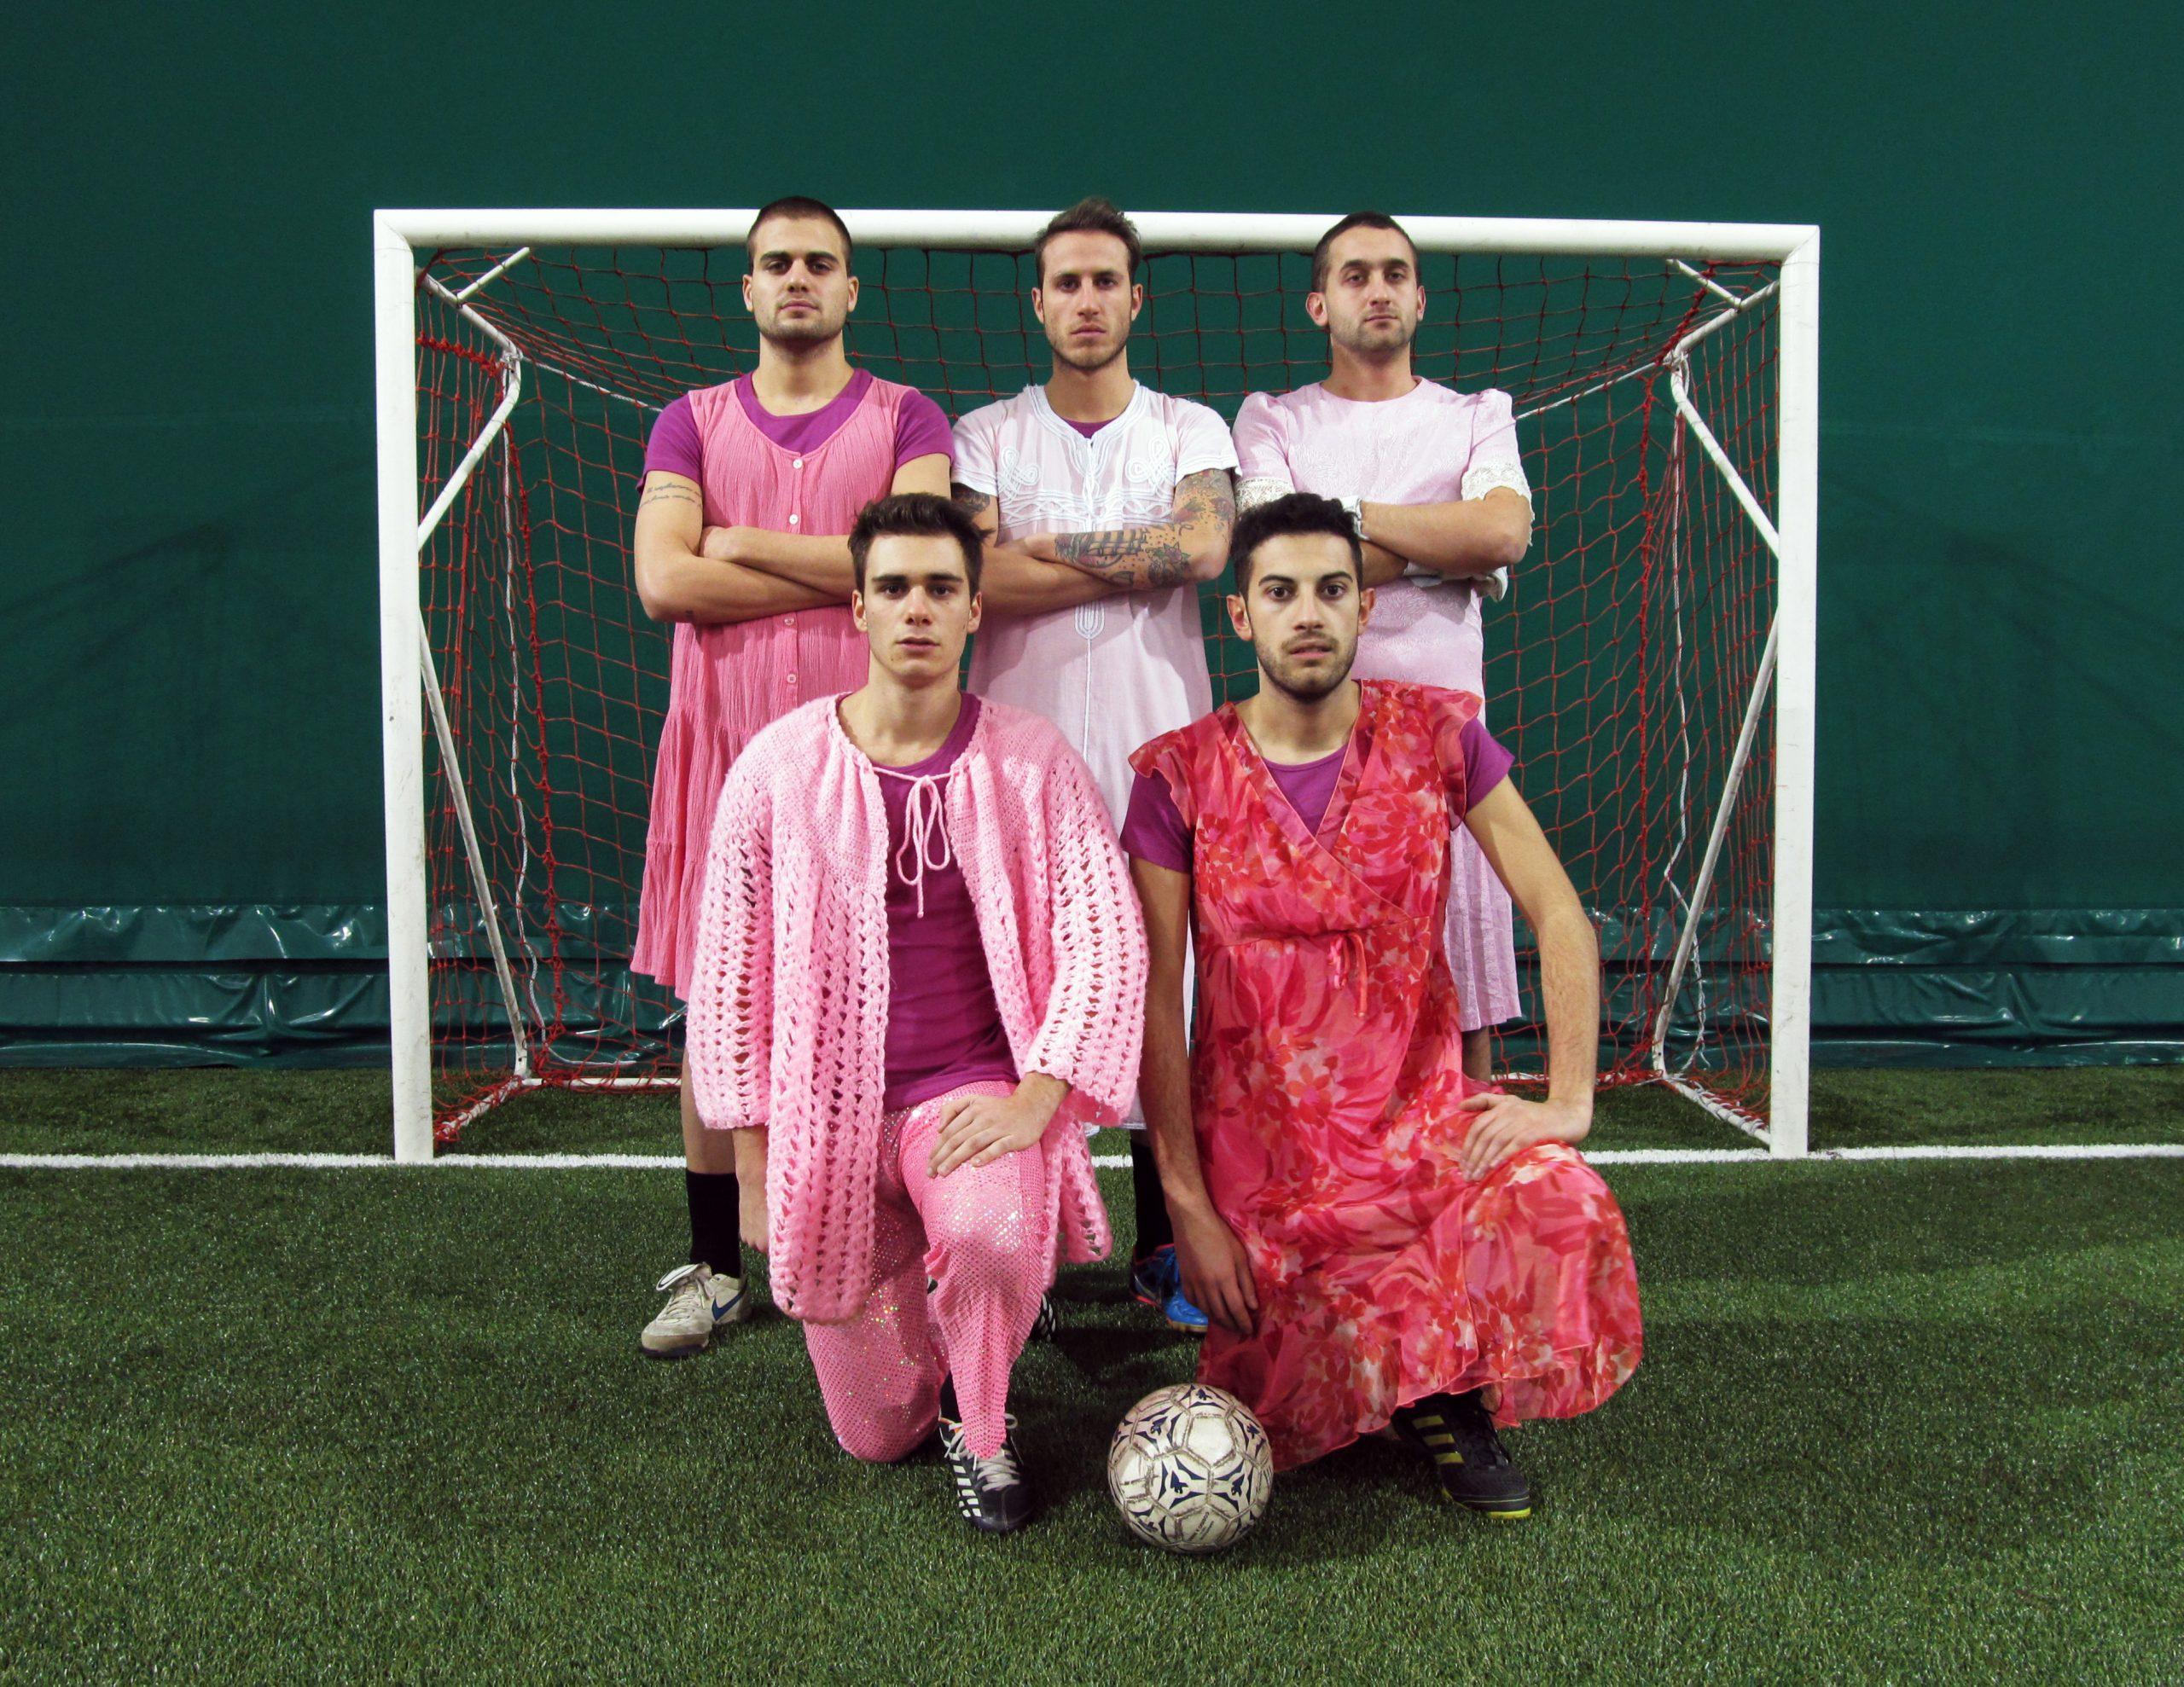 Football Match 2014 (Pink team) Luca Bosani